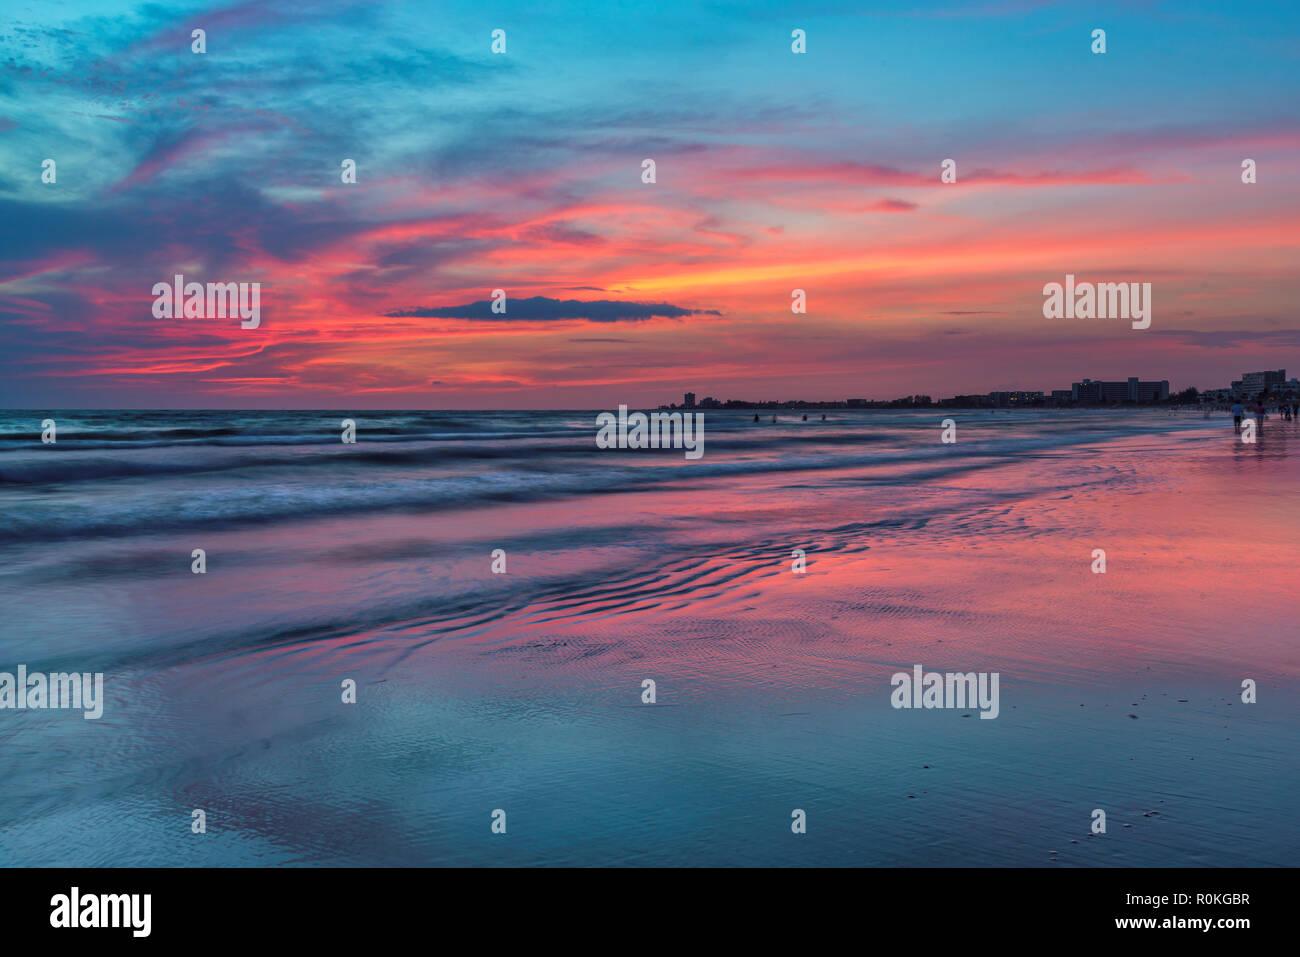 Sunset at Siesta Key beach, Florida, - Stock Image